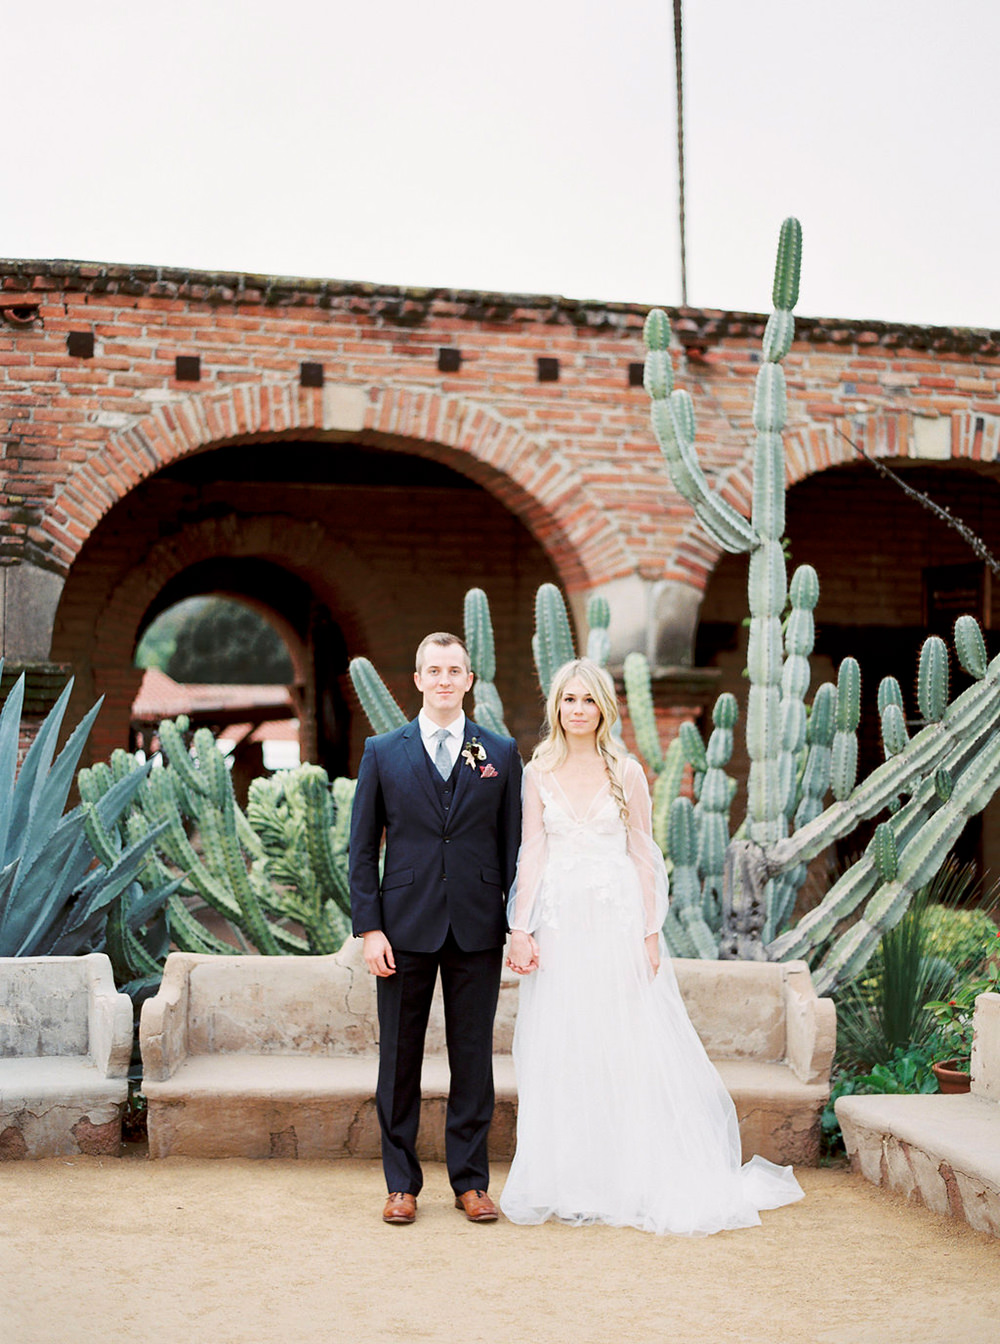 San Juan Capistrano weddings - photo by Amanda Lenhardt http://ruffledblog.com/relaxed-san-juan-capistrano-wedding-inspiration